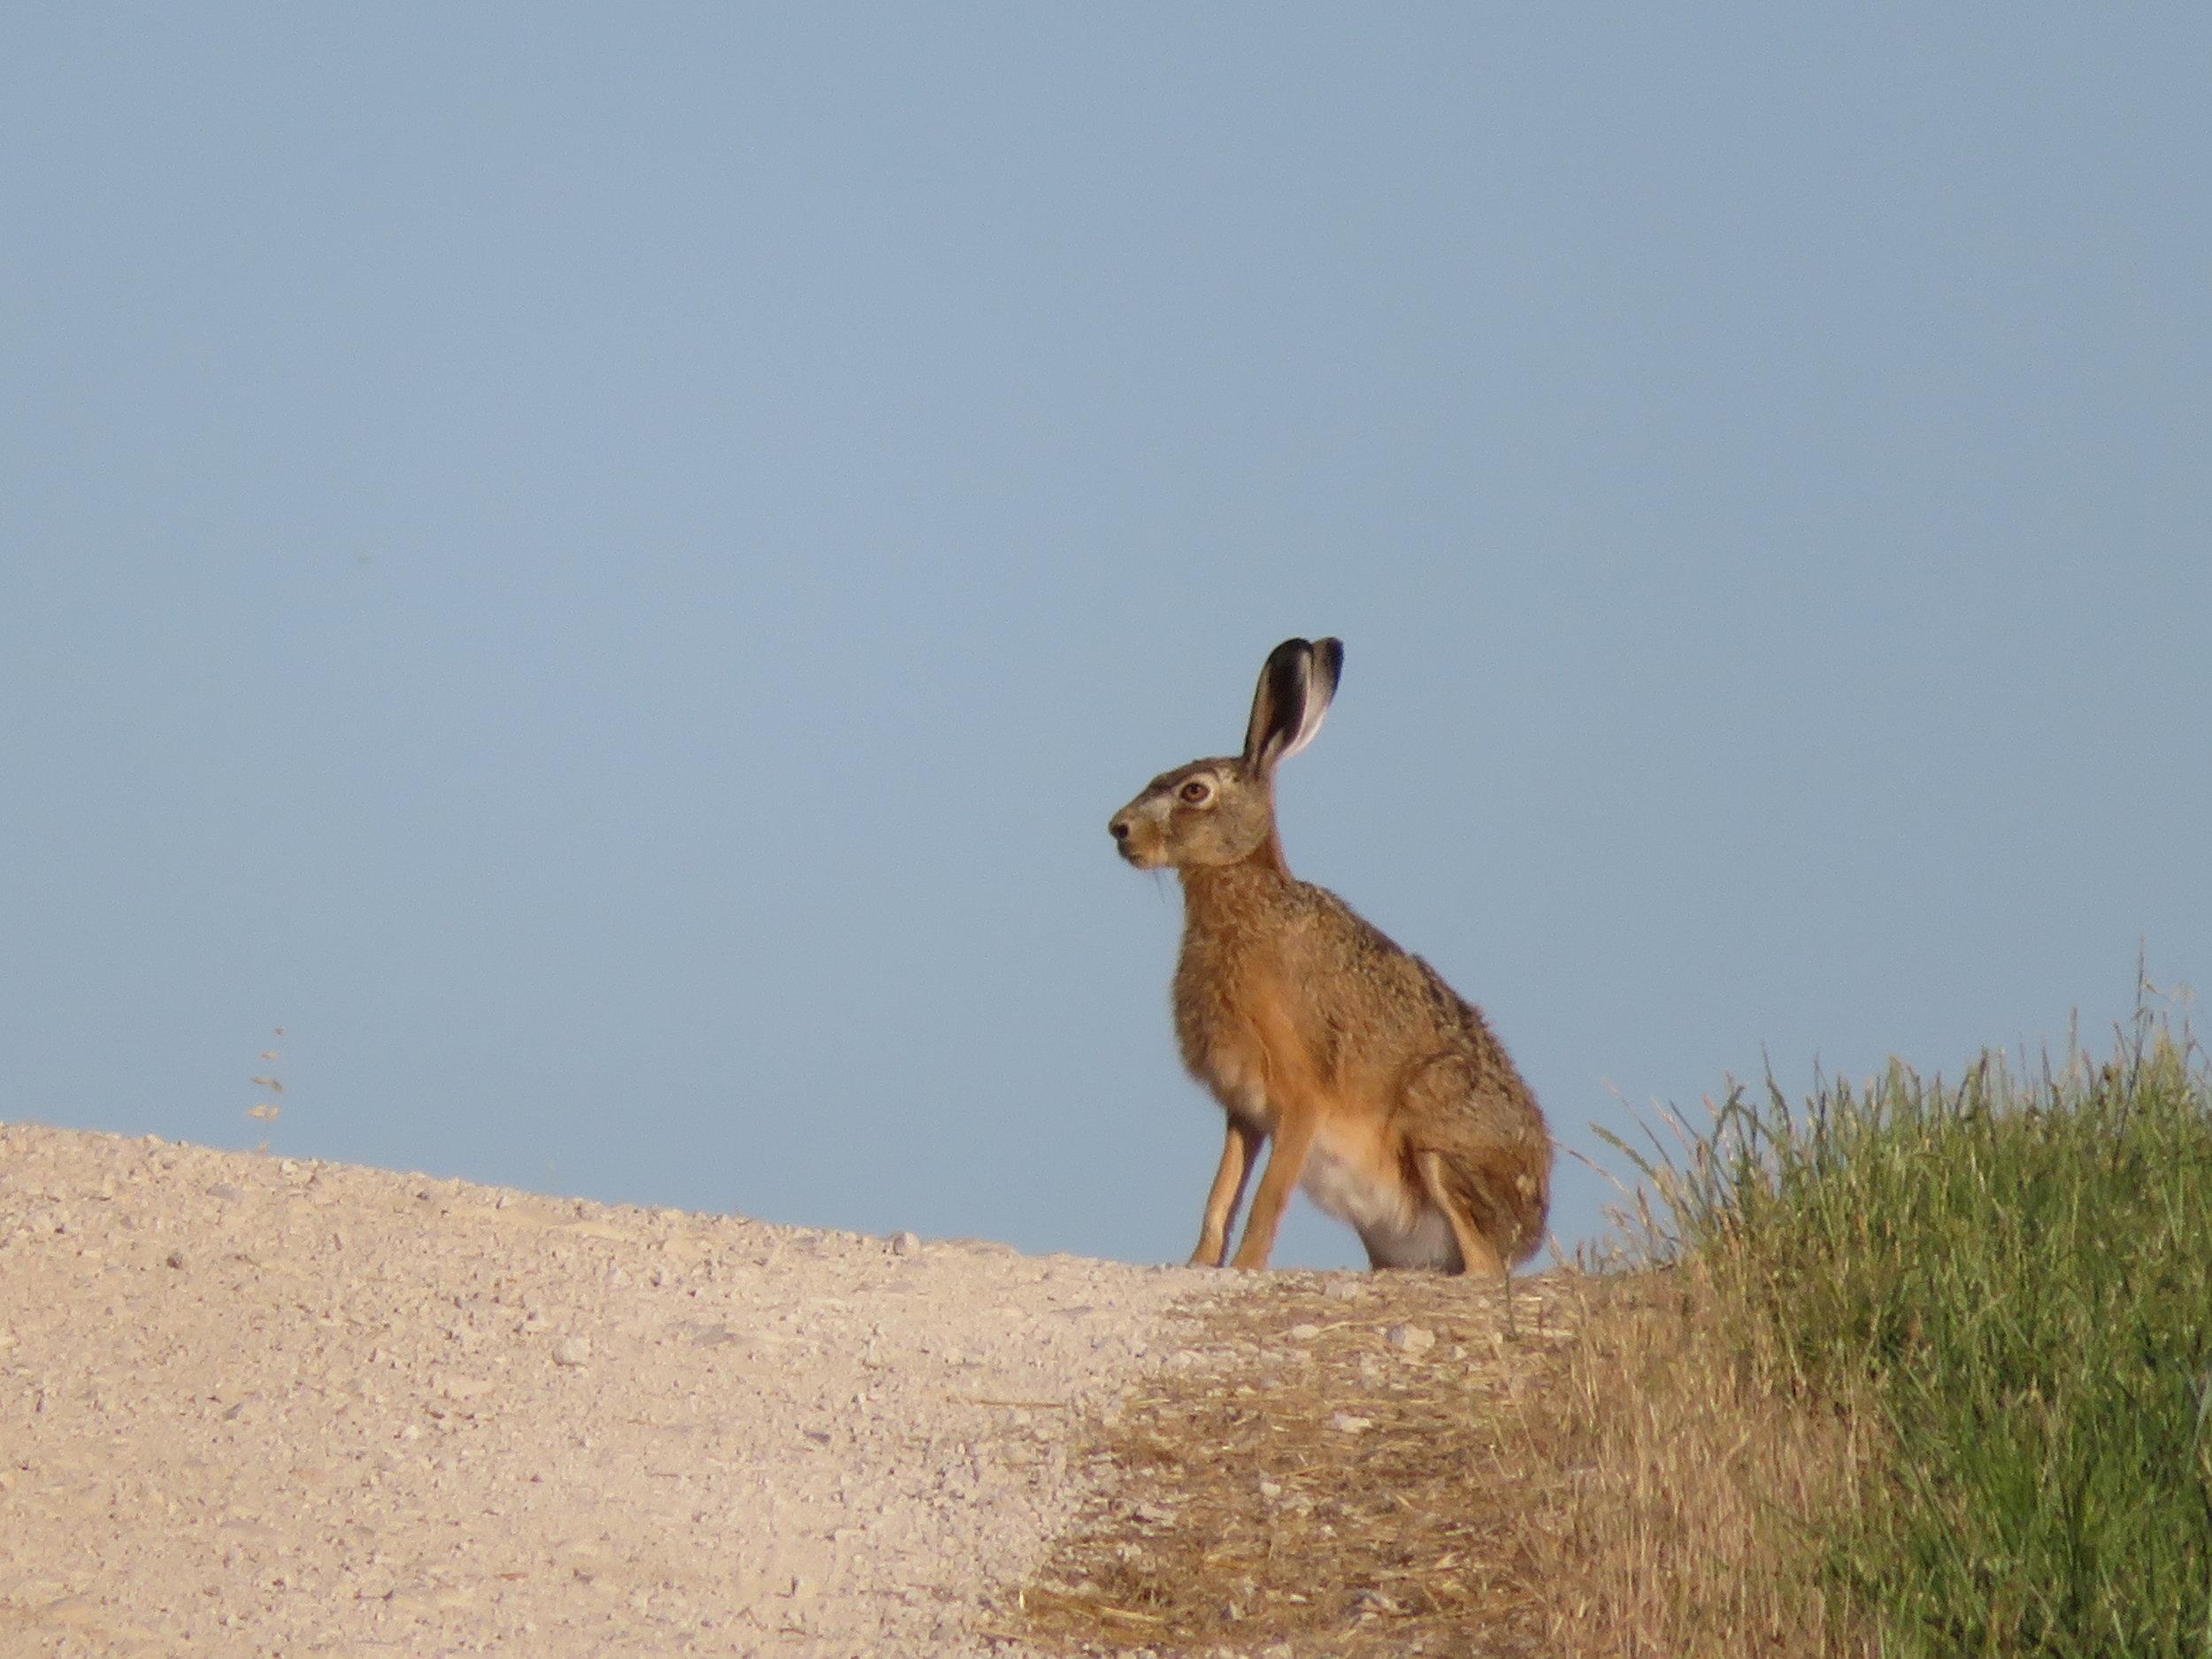 A giant hare? A jackelope? Maybe a long eared kangaroo?